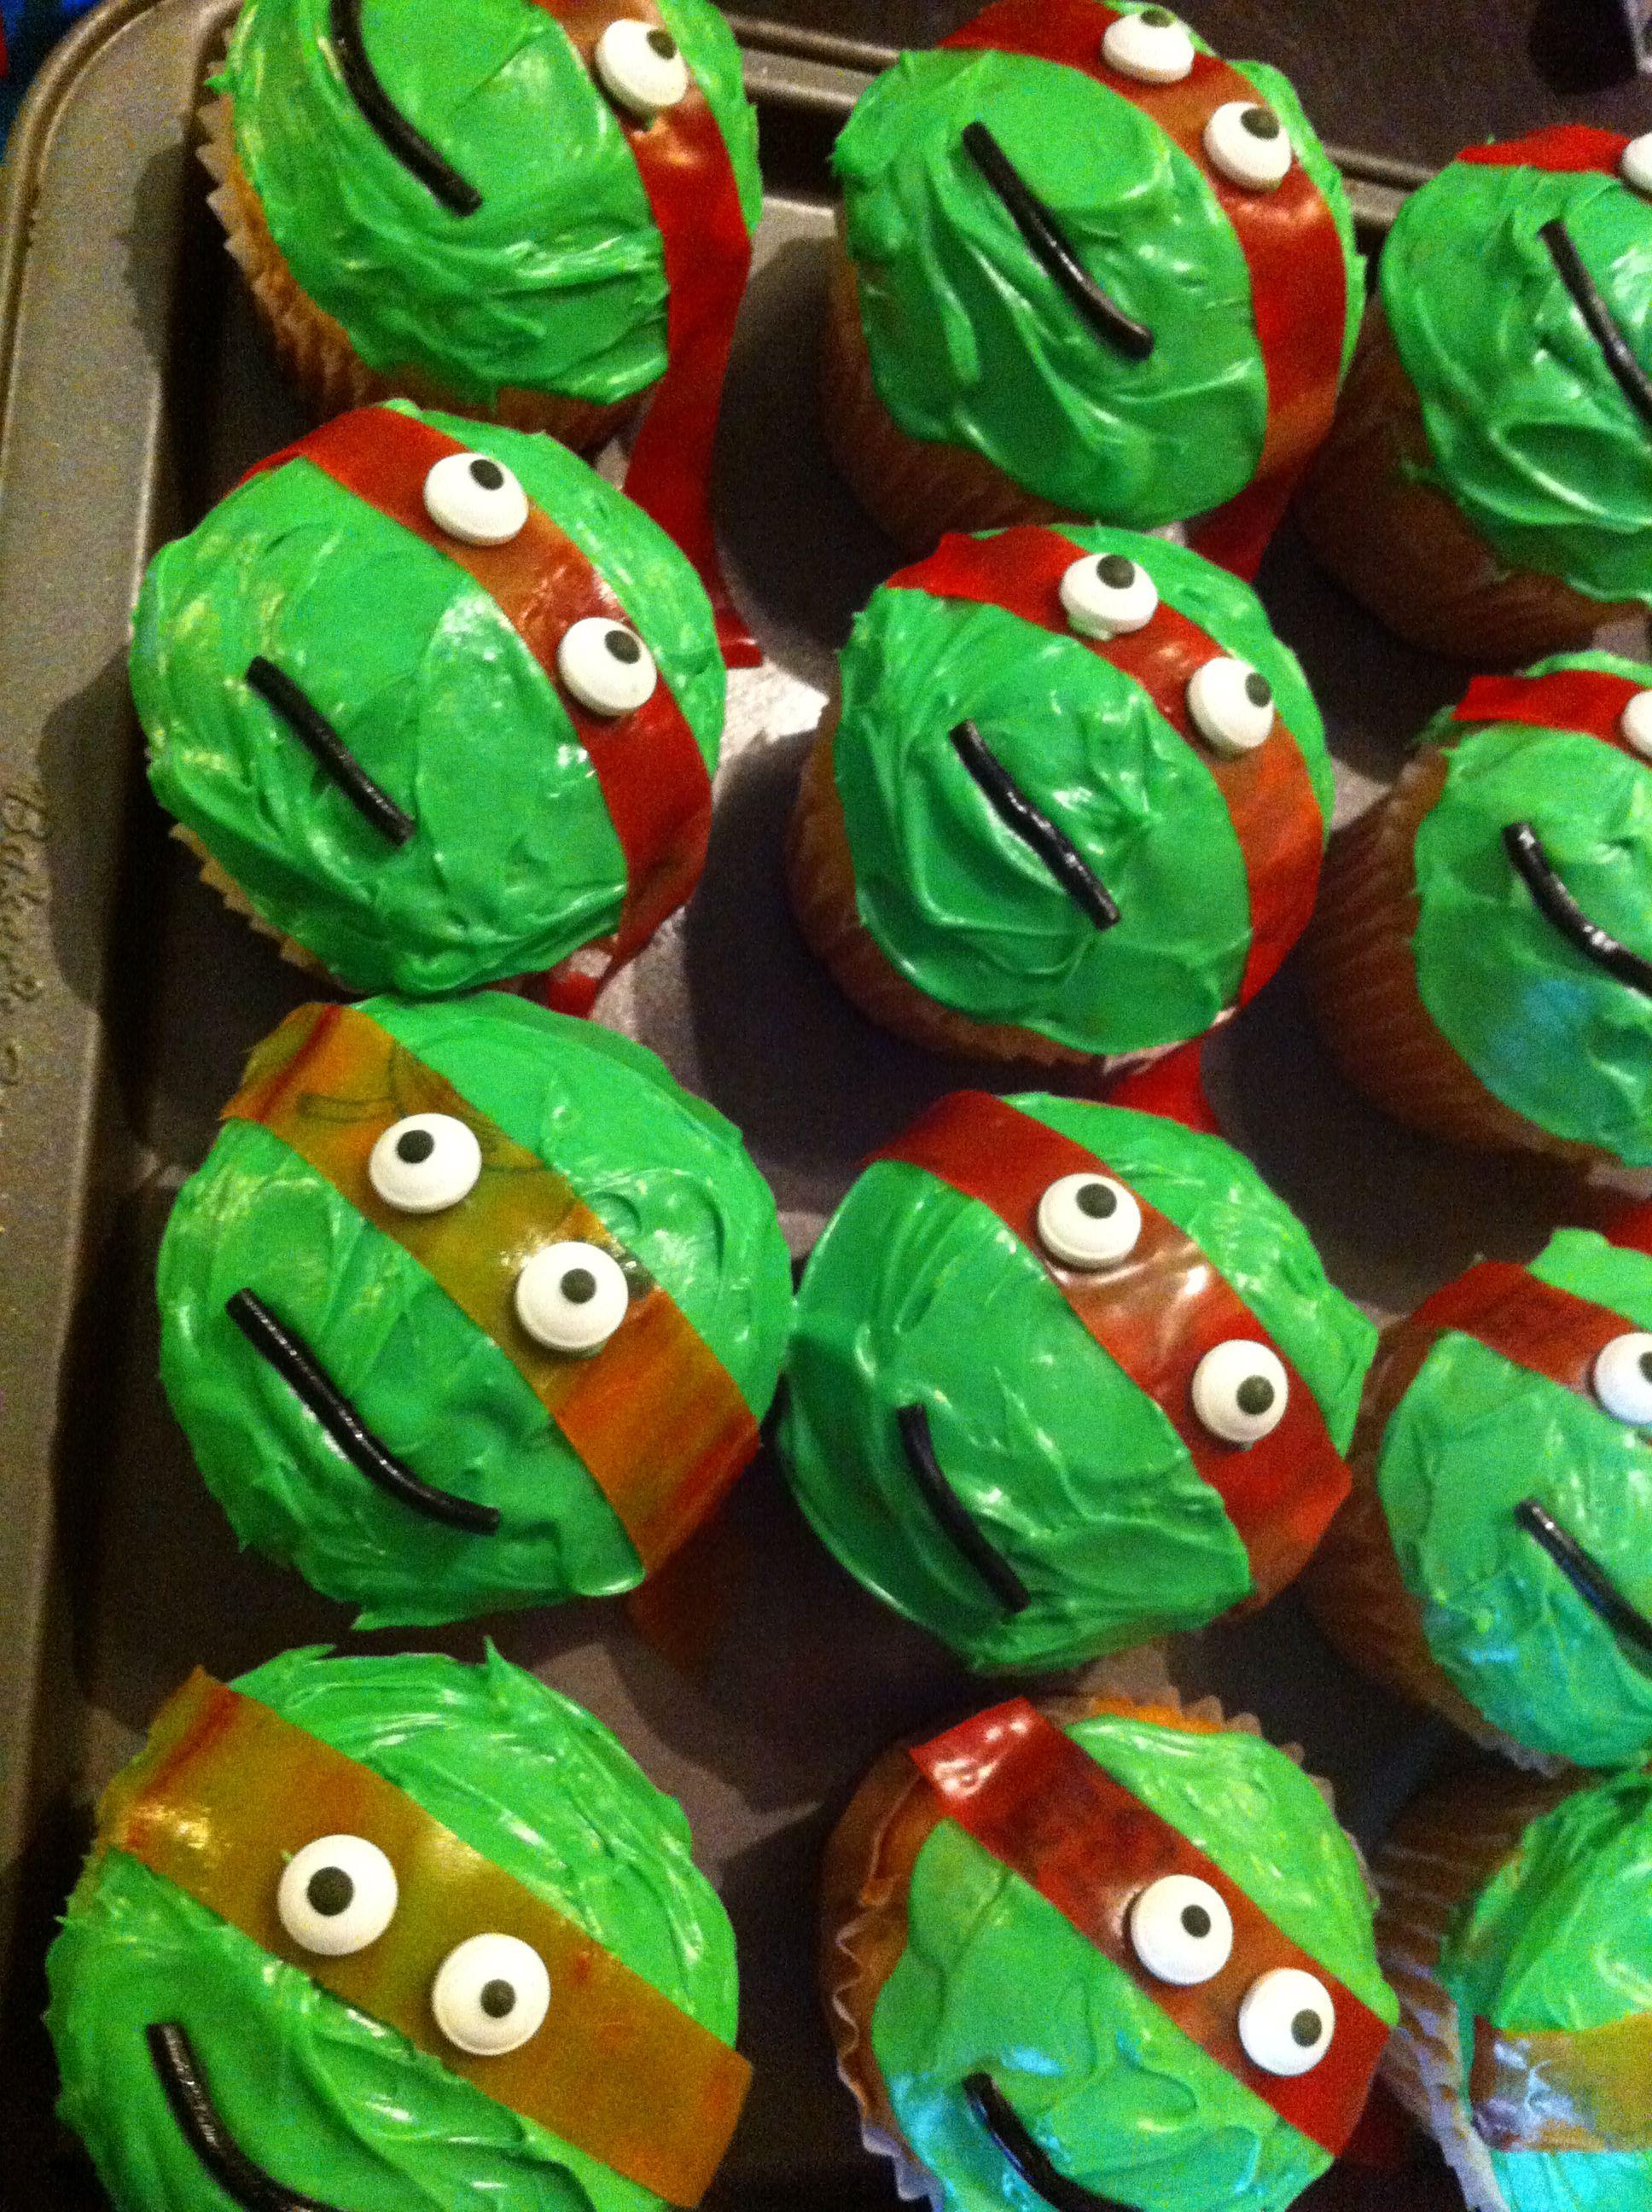 Ninja fruit cut - Teenage Mutant Ninja Turtle Cupcakes Orange And Red Fruit Roll Ups For The Mask